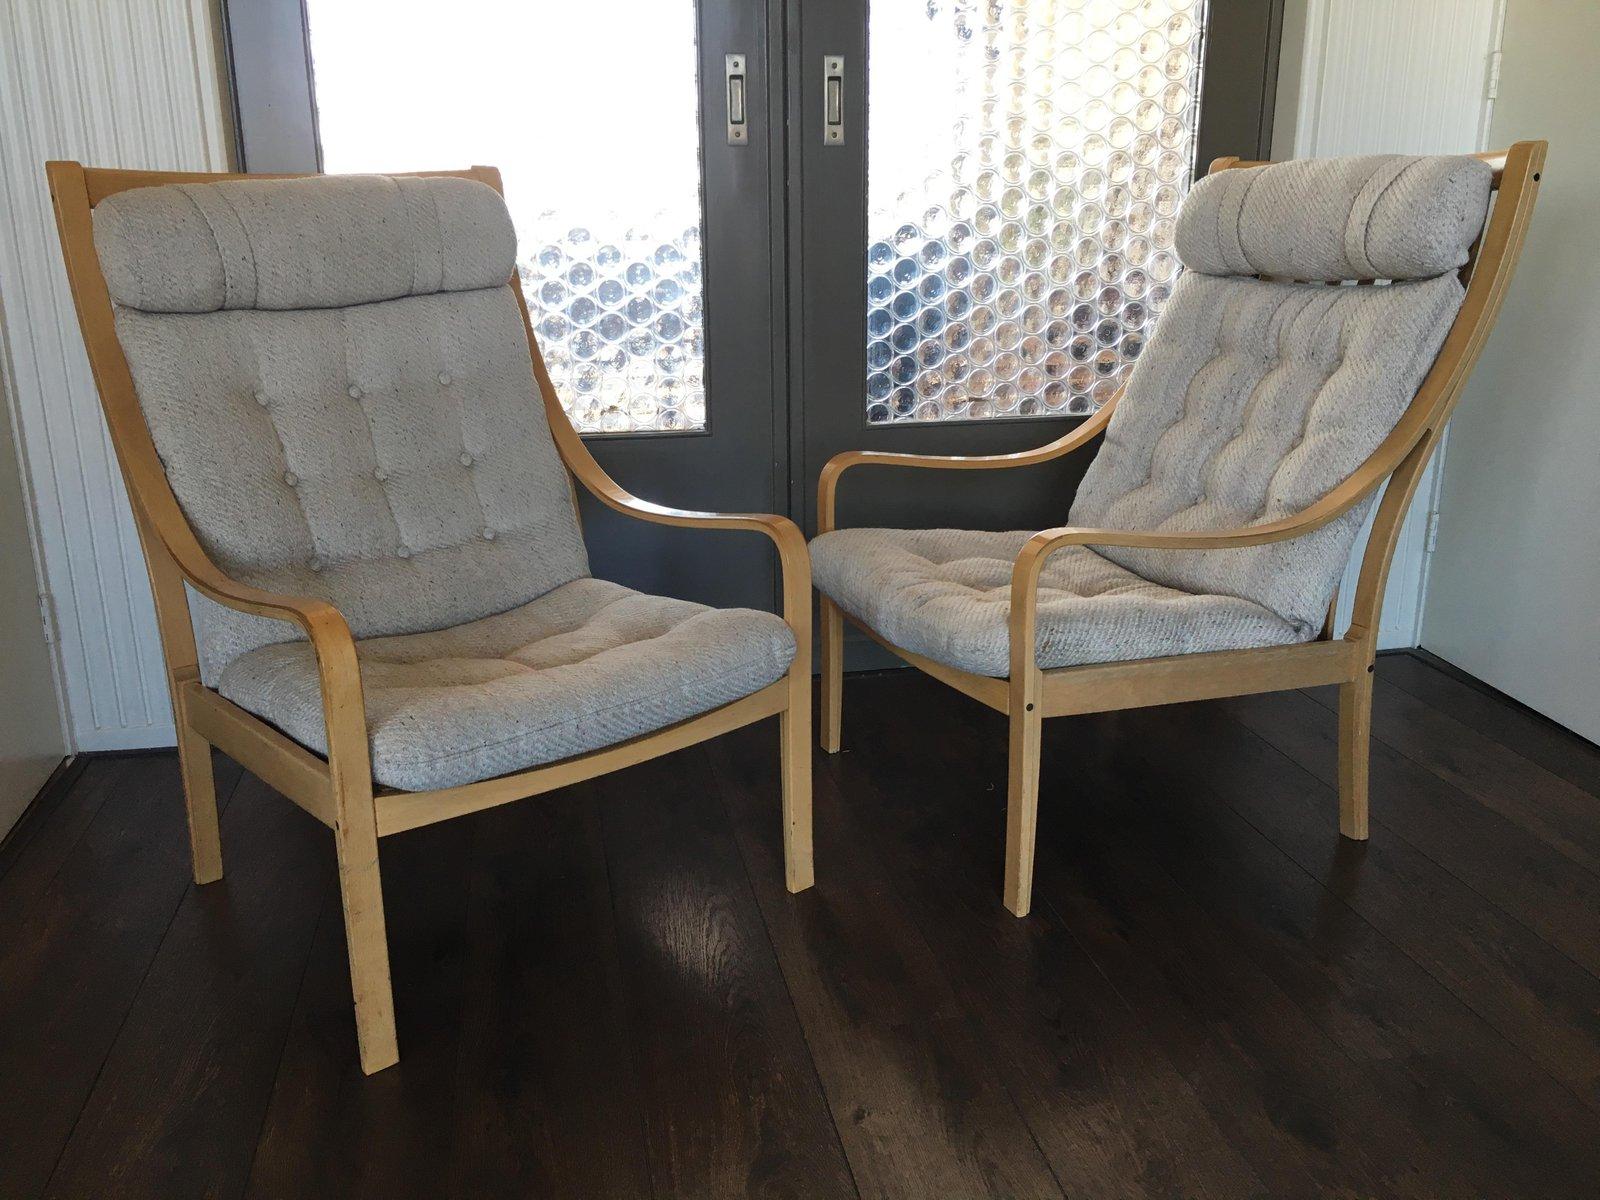 Dänischer Vintage Buchenholz Sessel